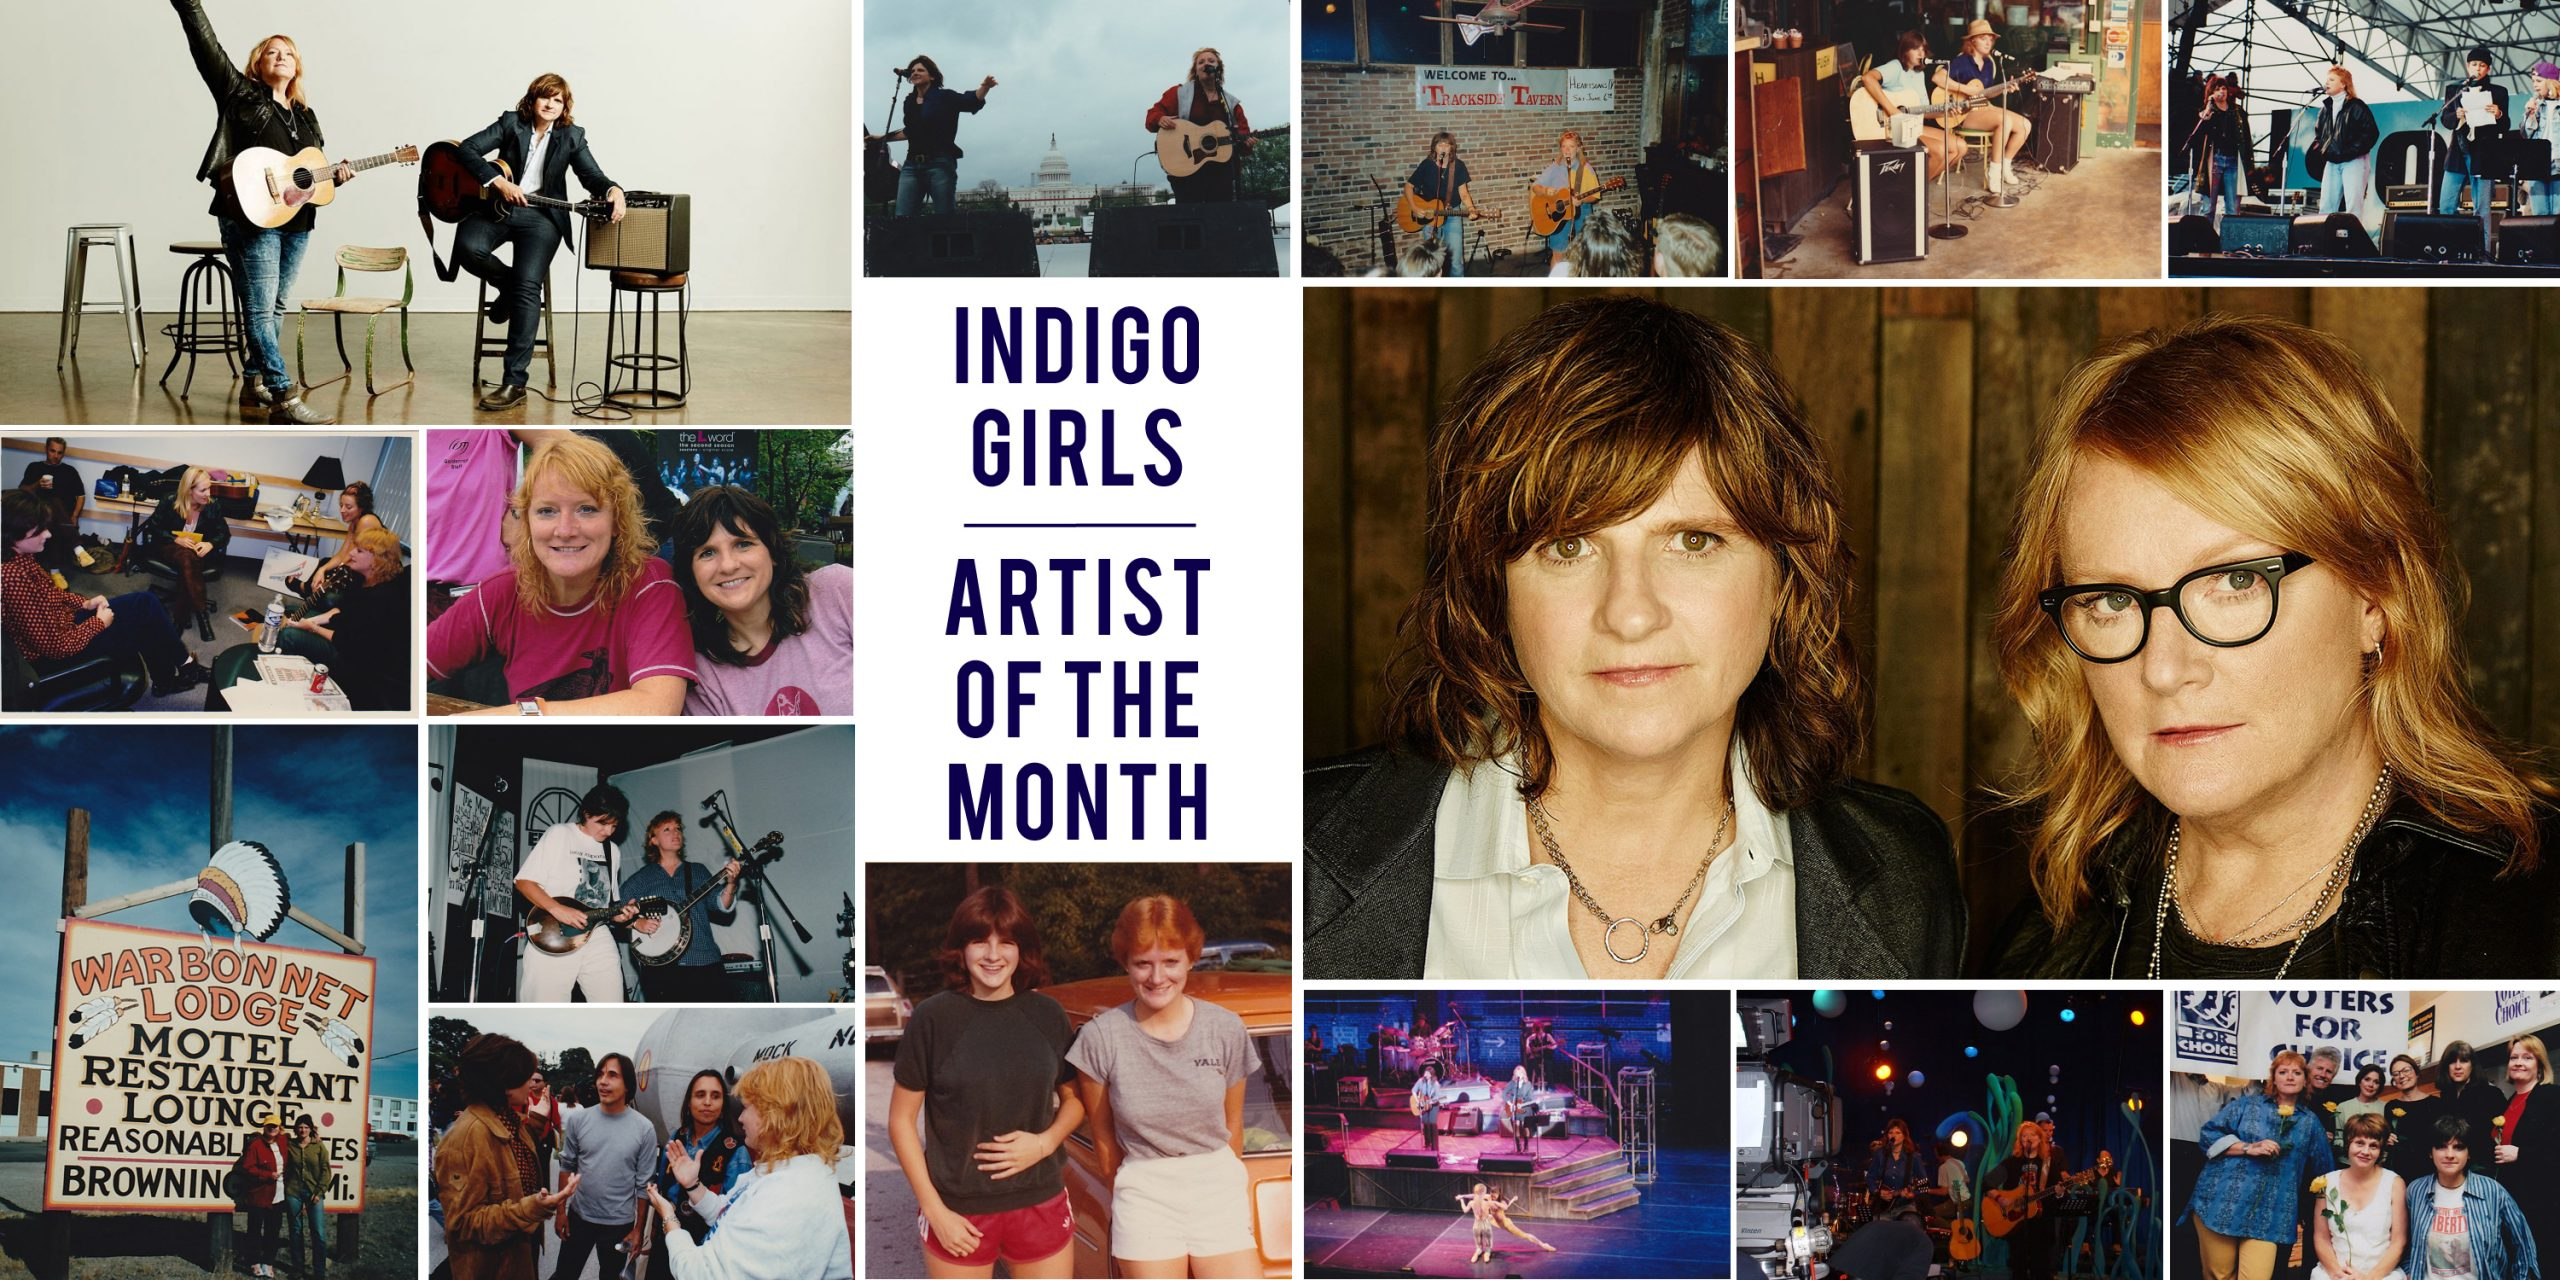 The Power of Two: 30 Years of Indigo Girls